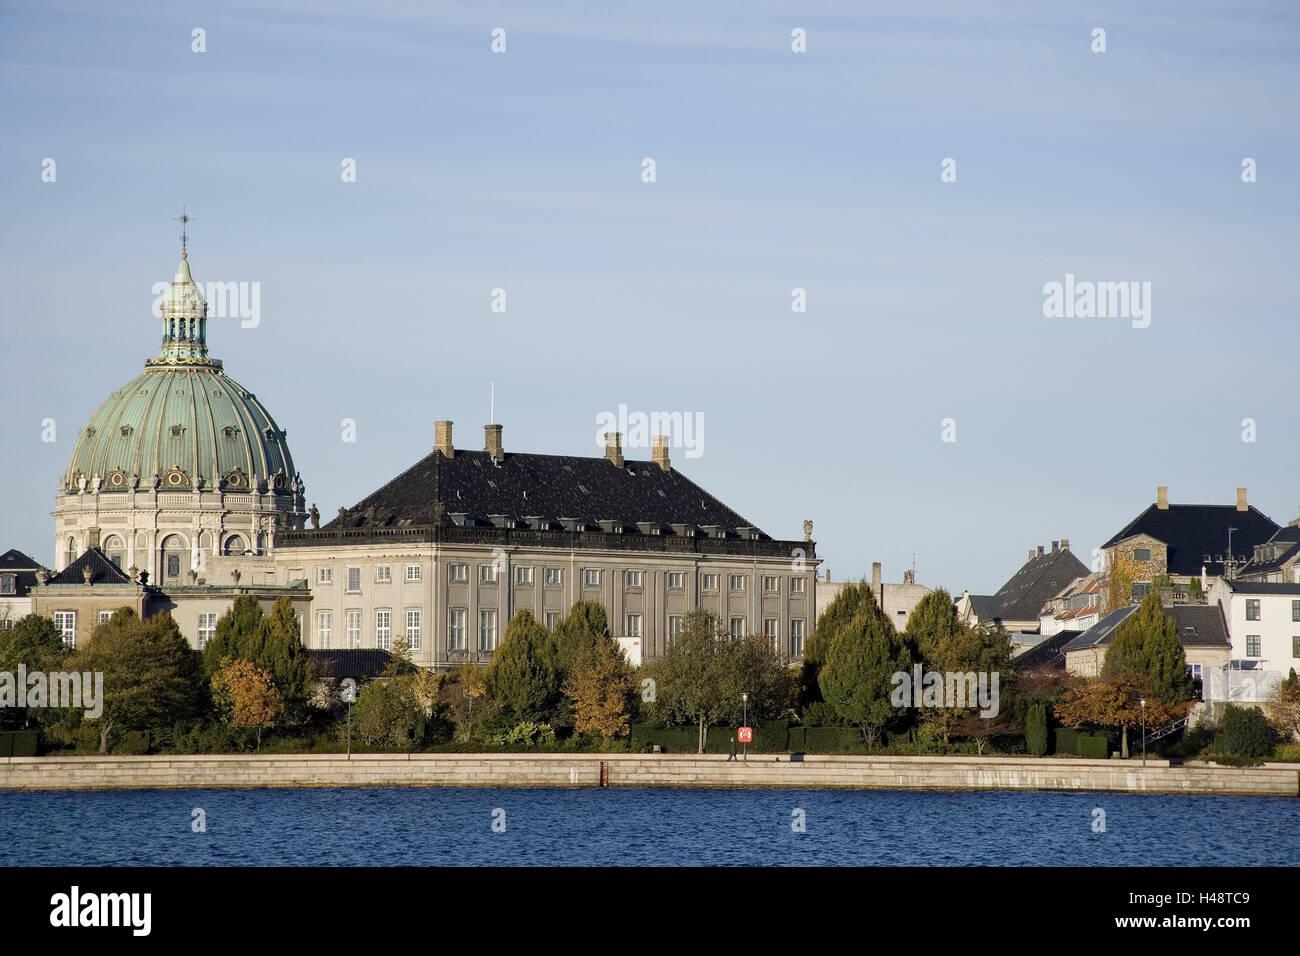 Denmark, Copenhagen, Christianshavn, Amalienborg slot, Frederikskirken, capital, castle Amalienborg, Marmorkirken, - Stock Image